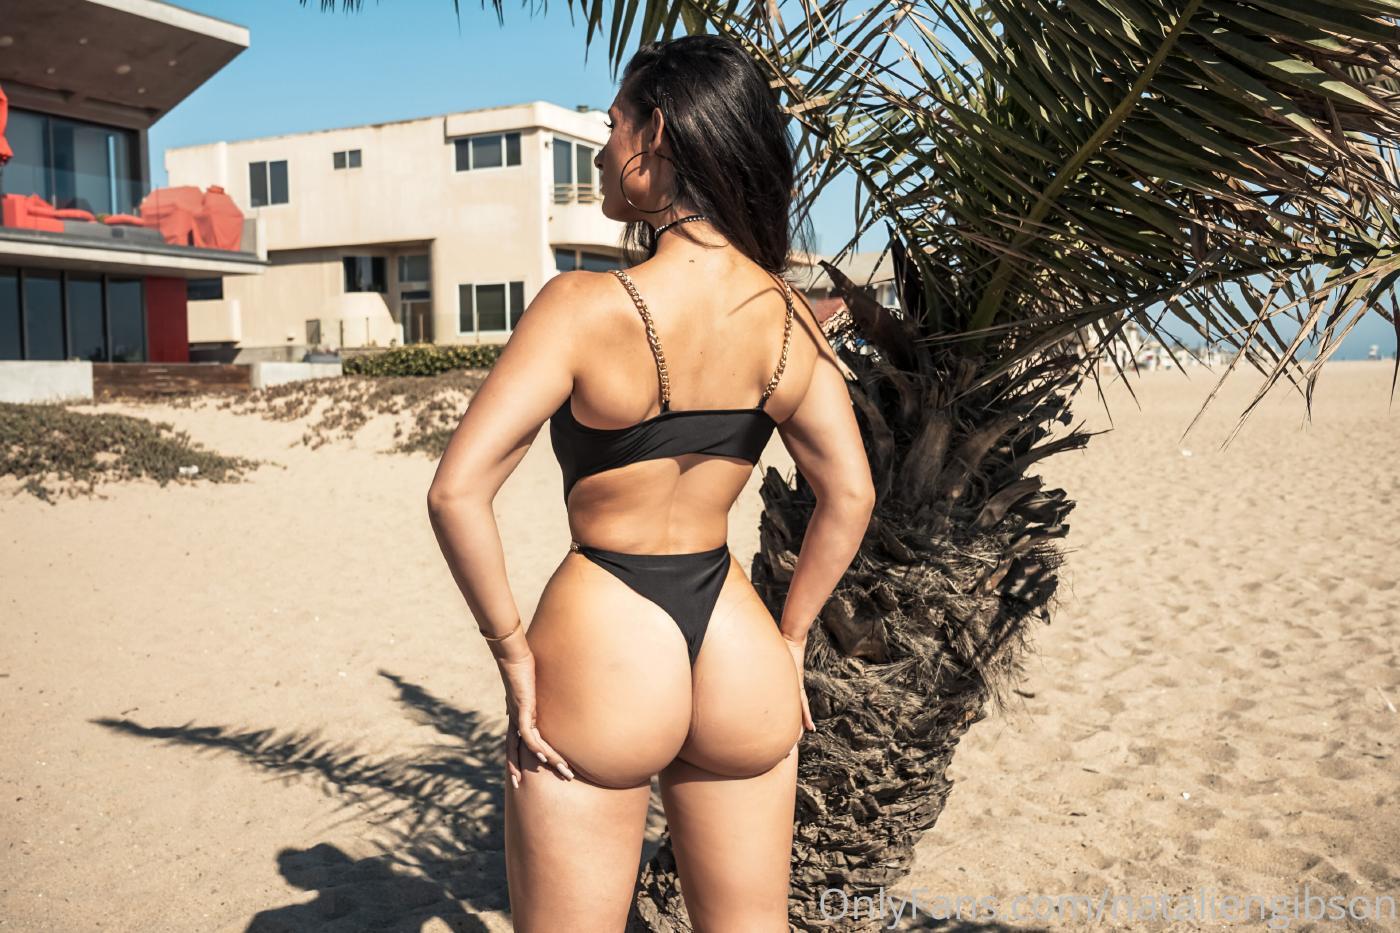 Natalie Gibson Beach Bikini Onlyfans Set Leaked 0008